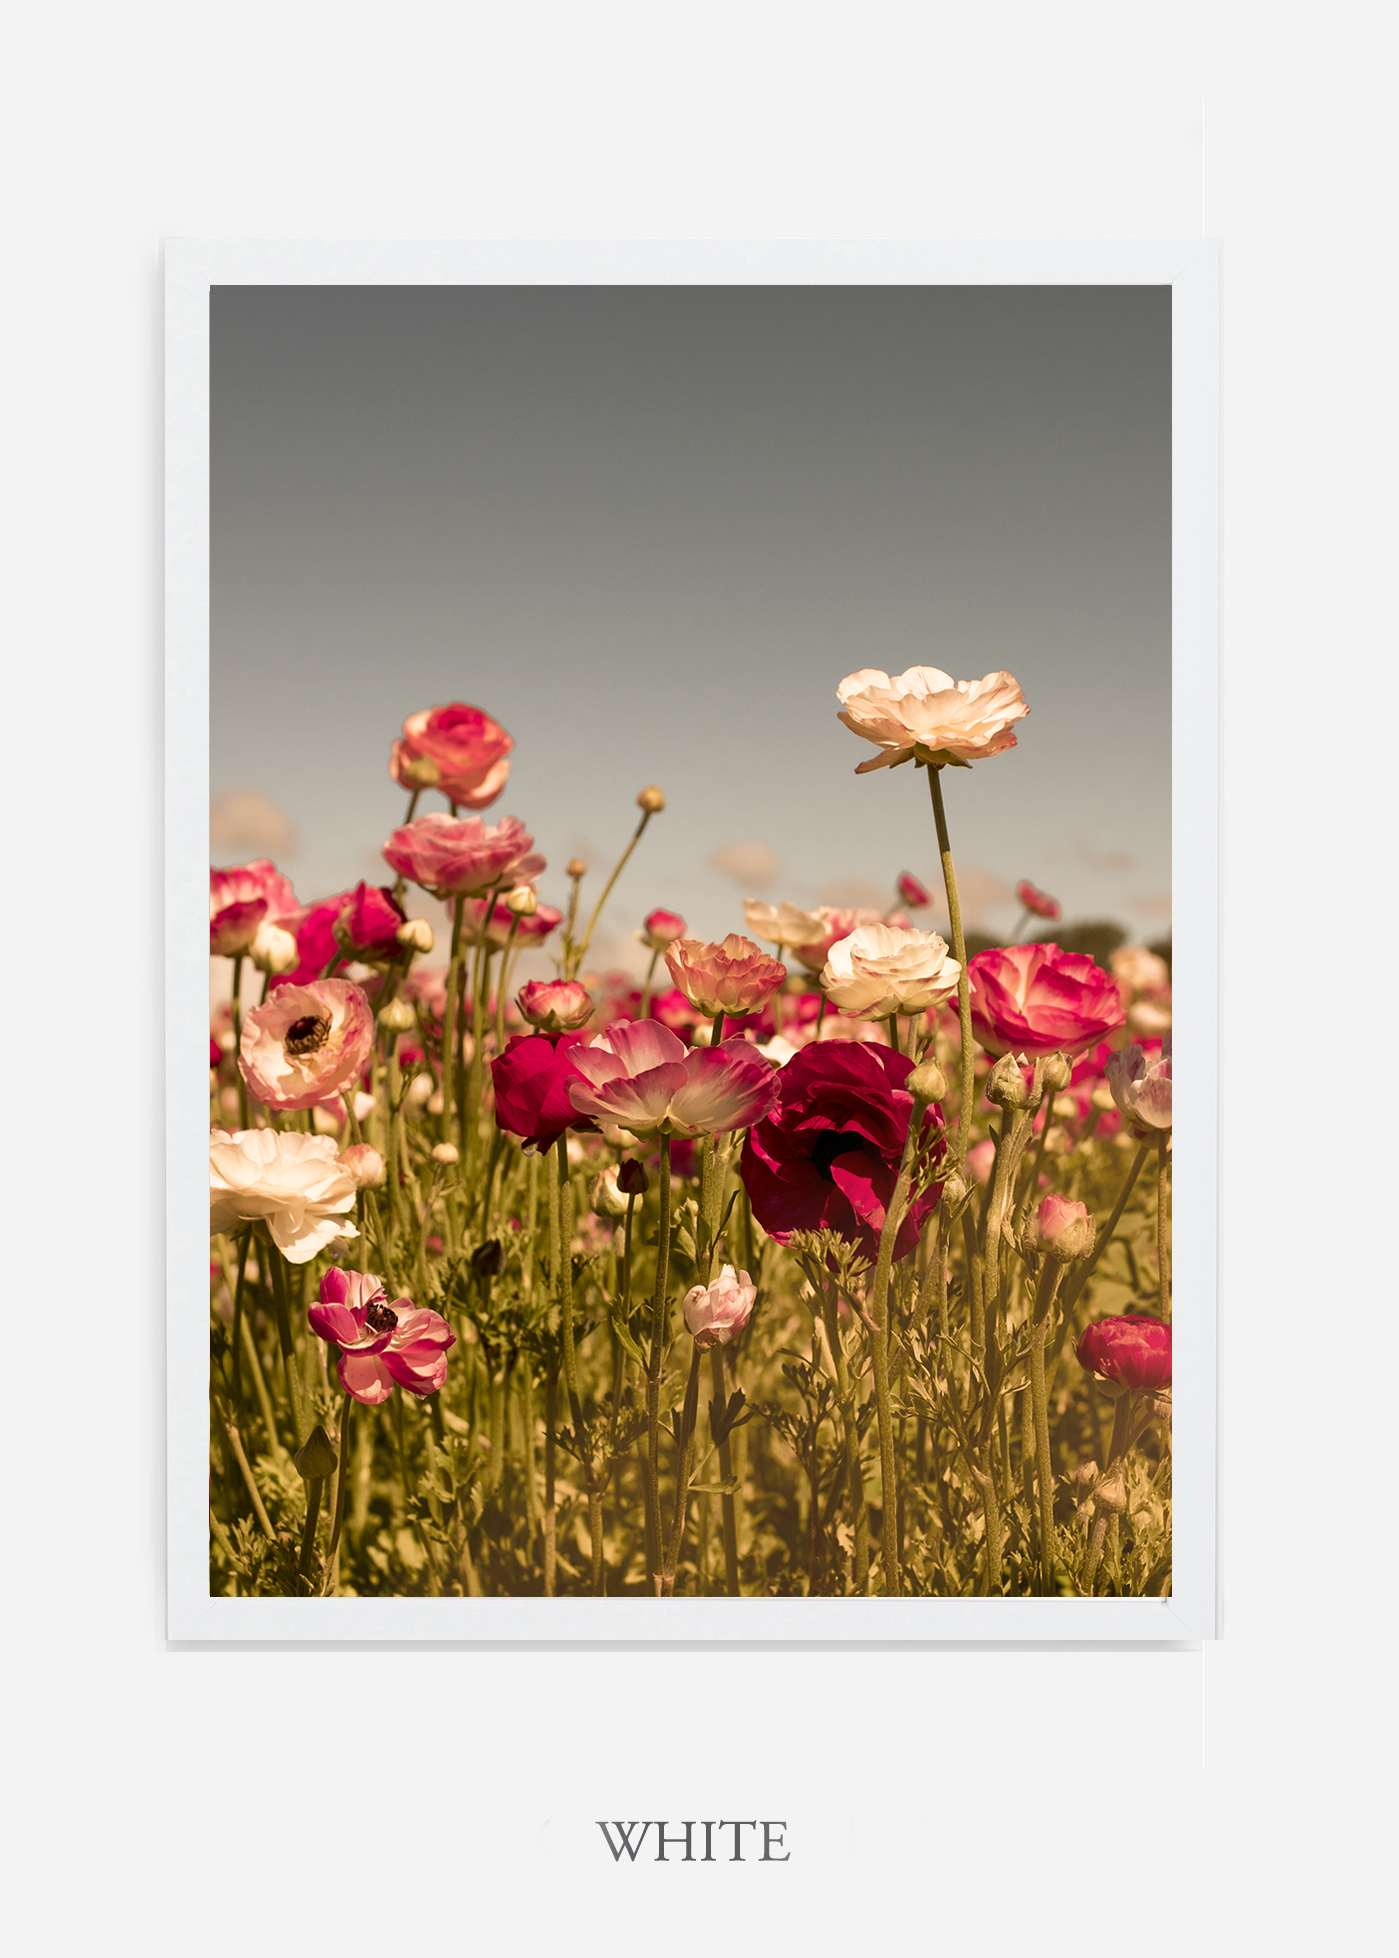 wilder-california-Floral-No.3-white-frame-no-mat-interior-design-botanical-print-art-floral-art.jpg